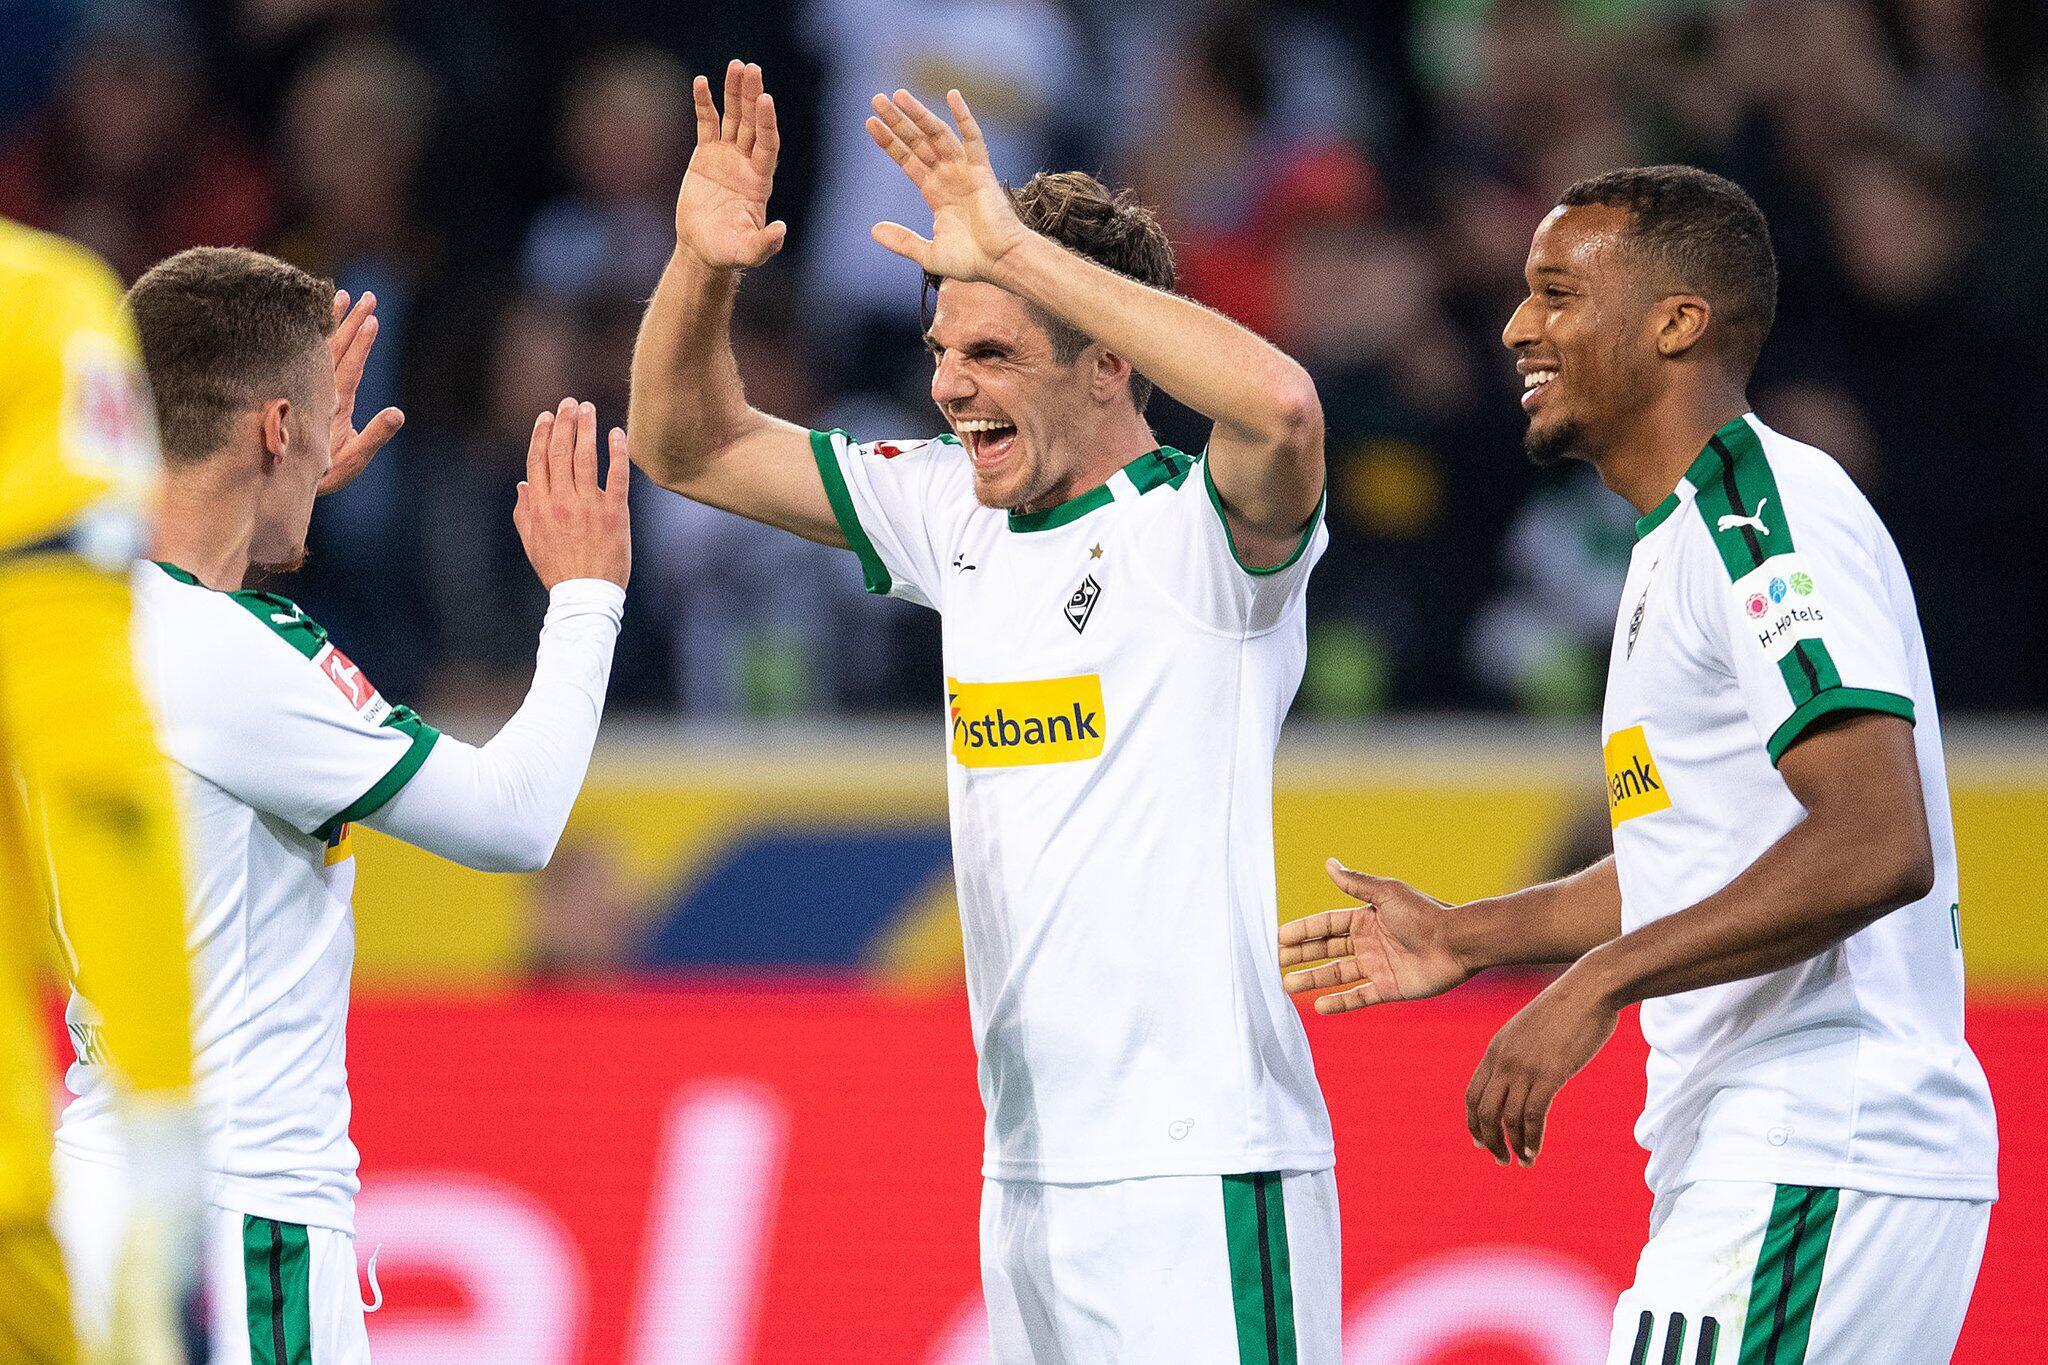 Bild zu Borussia Mönchengladbach - FSV Mainz 05